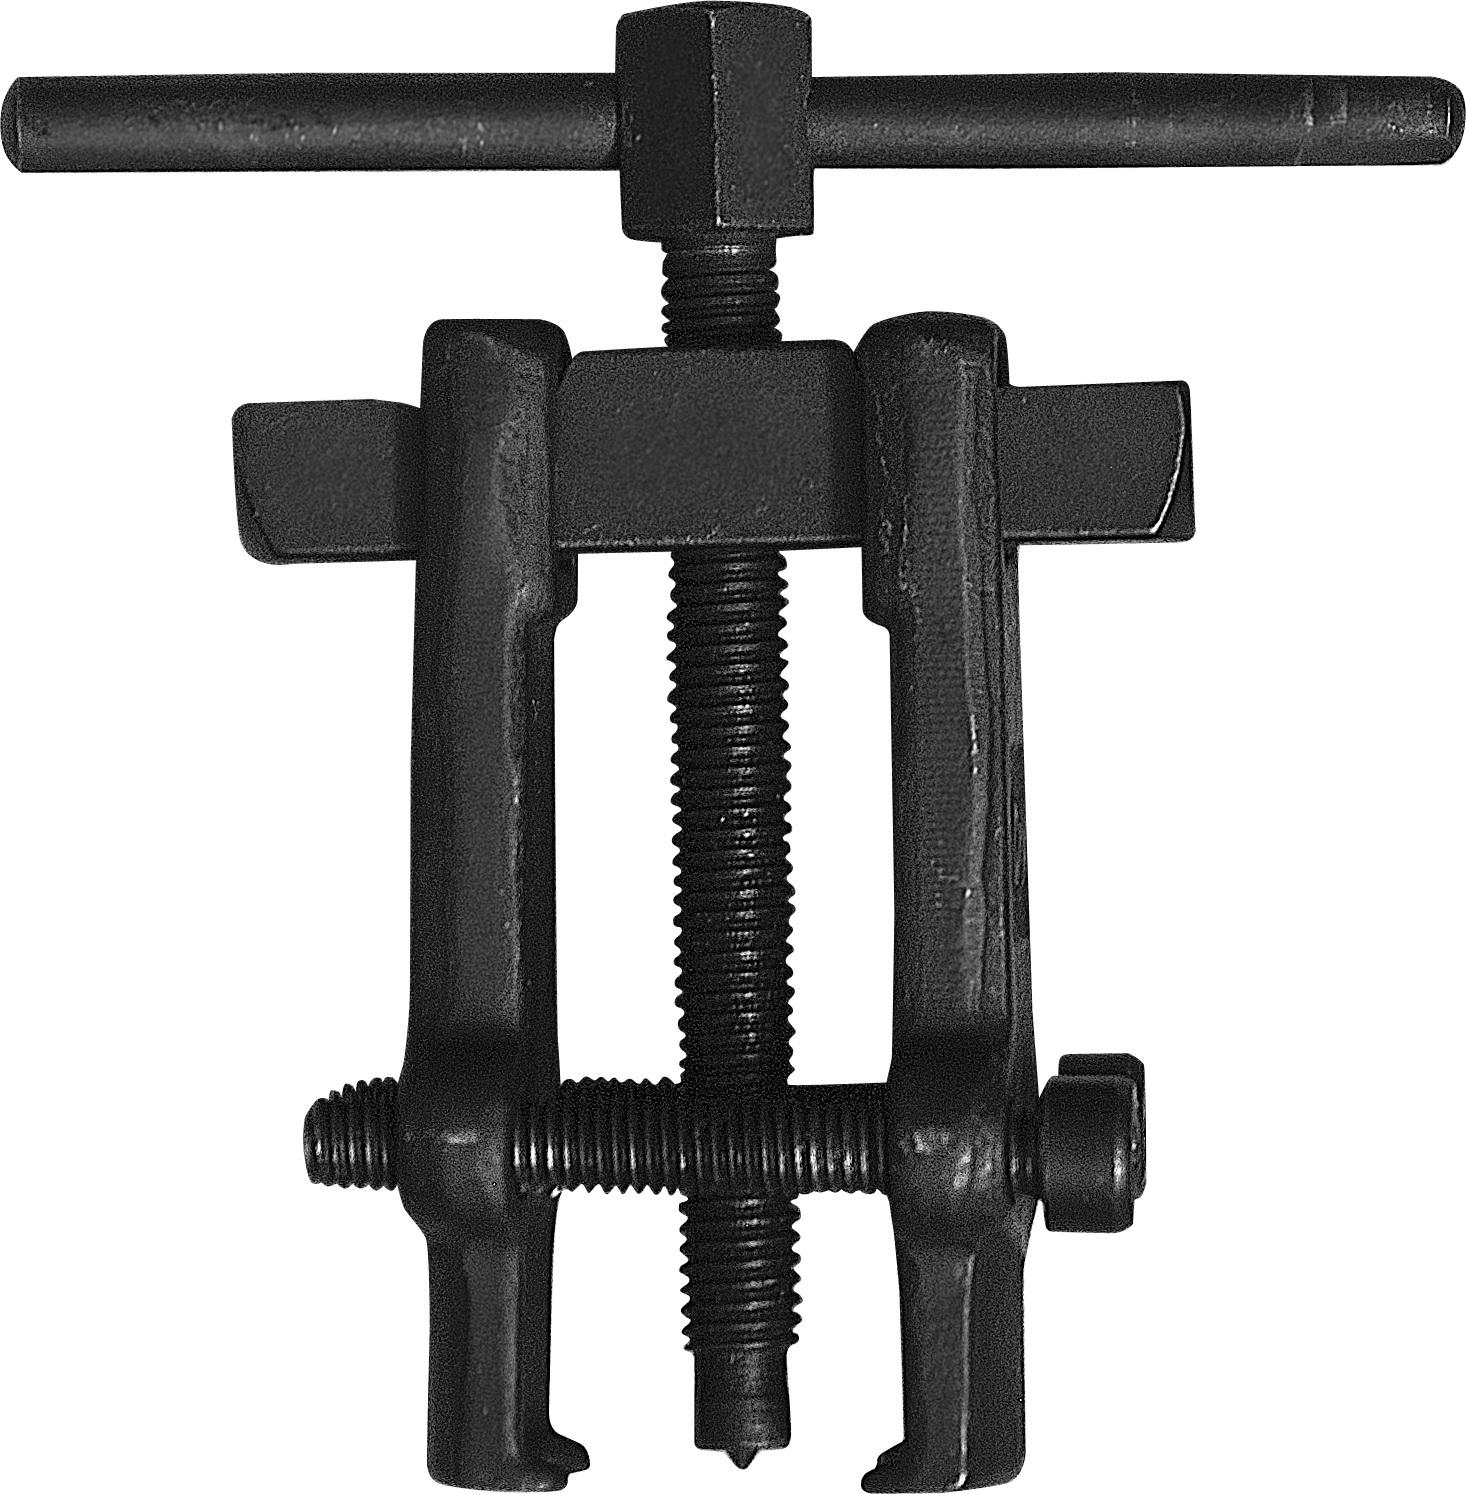 Съемник для подшипников КРАТОН 27-76 мм фильтр кратон 30103017